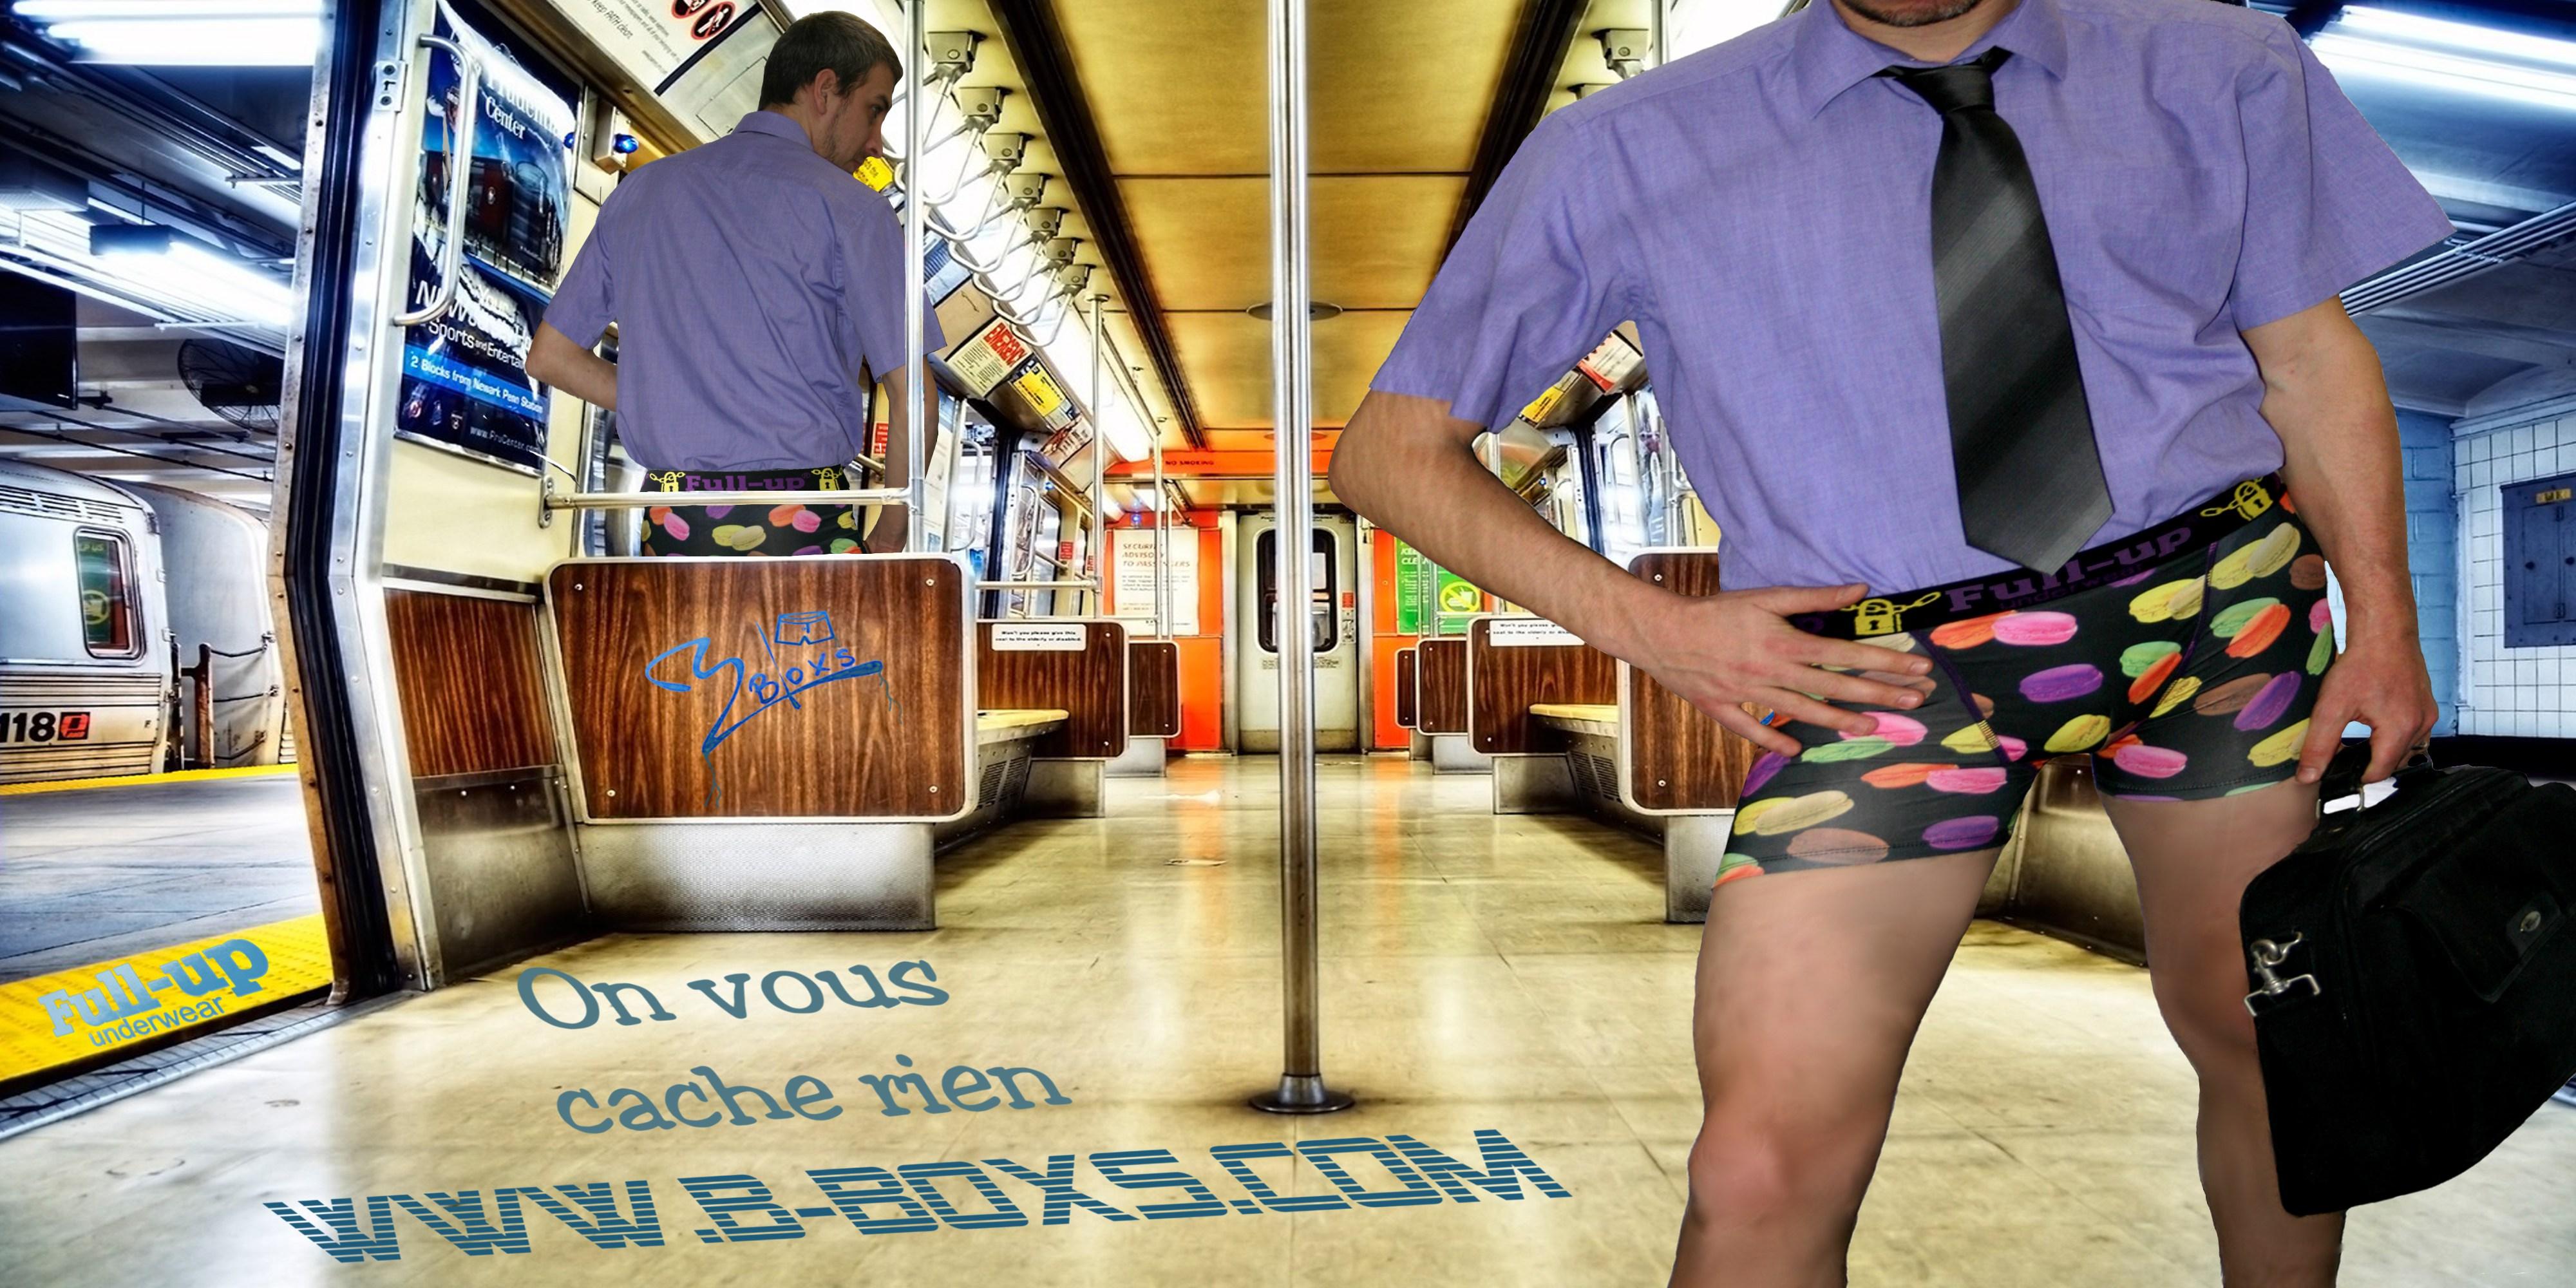 On ne vous cache rien boxer underwear full-up